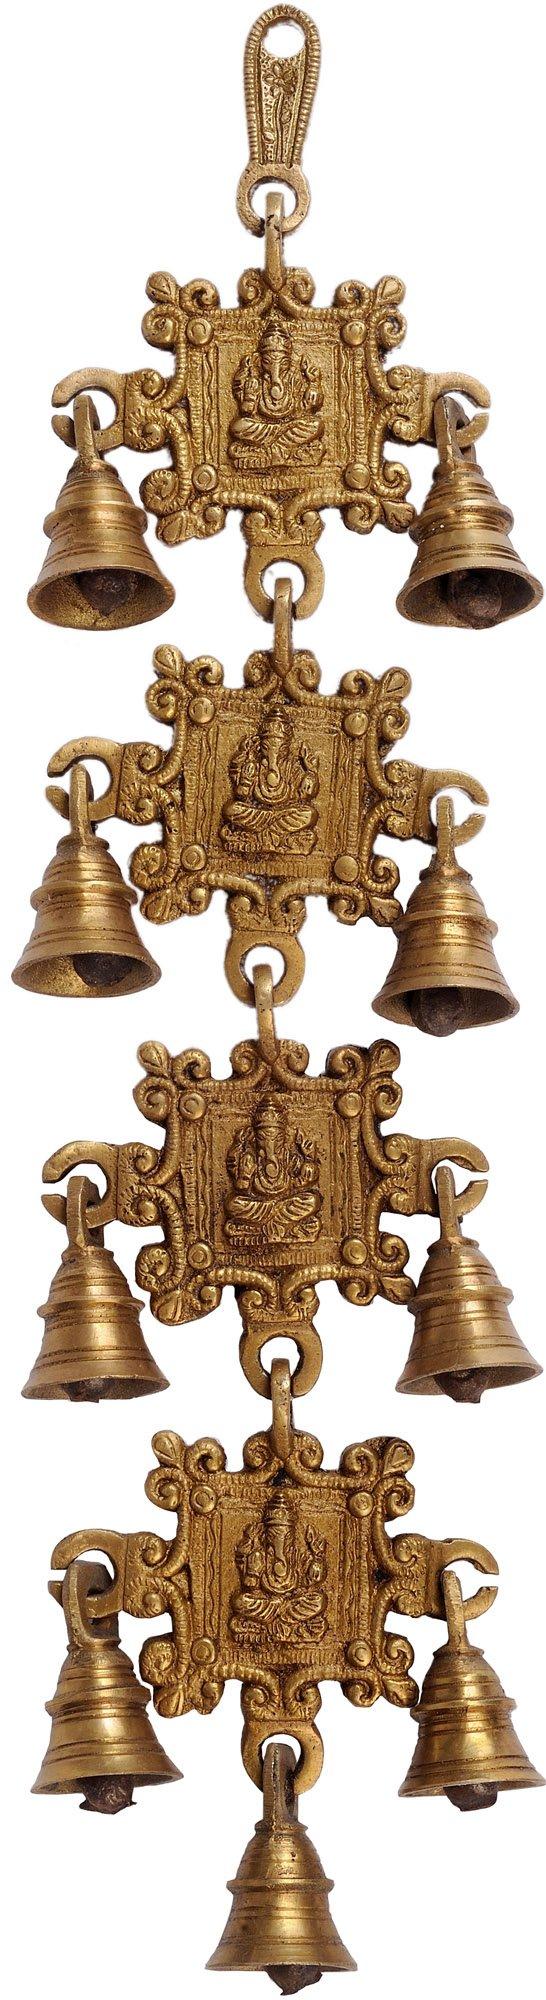 Ganesha Wall Hanging Bells - Brass Statue